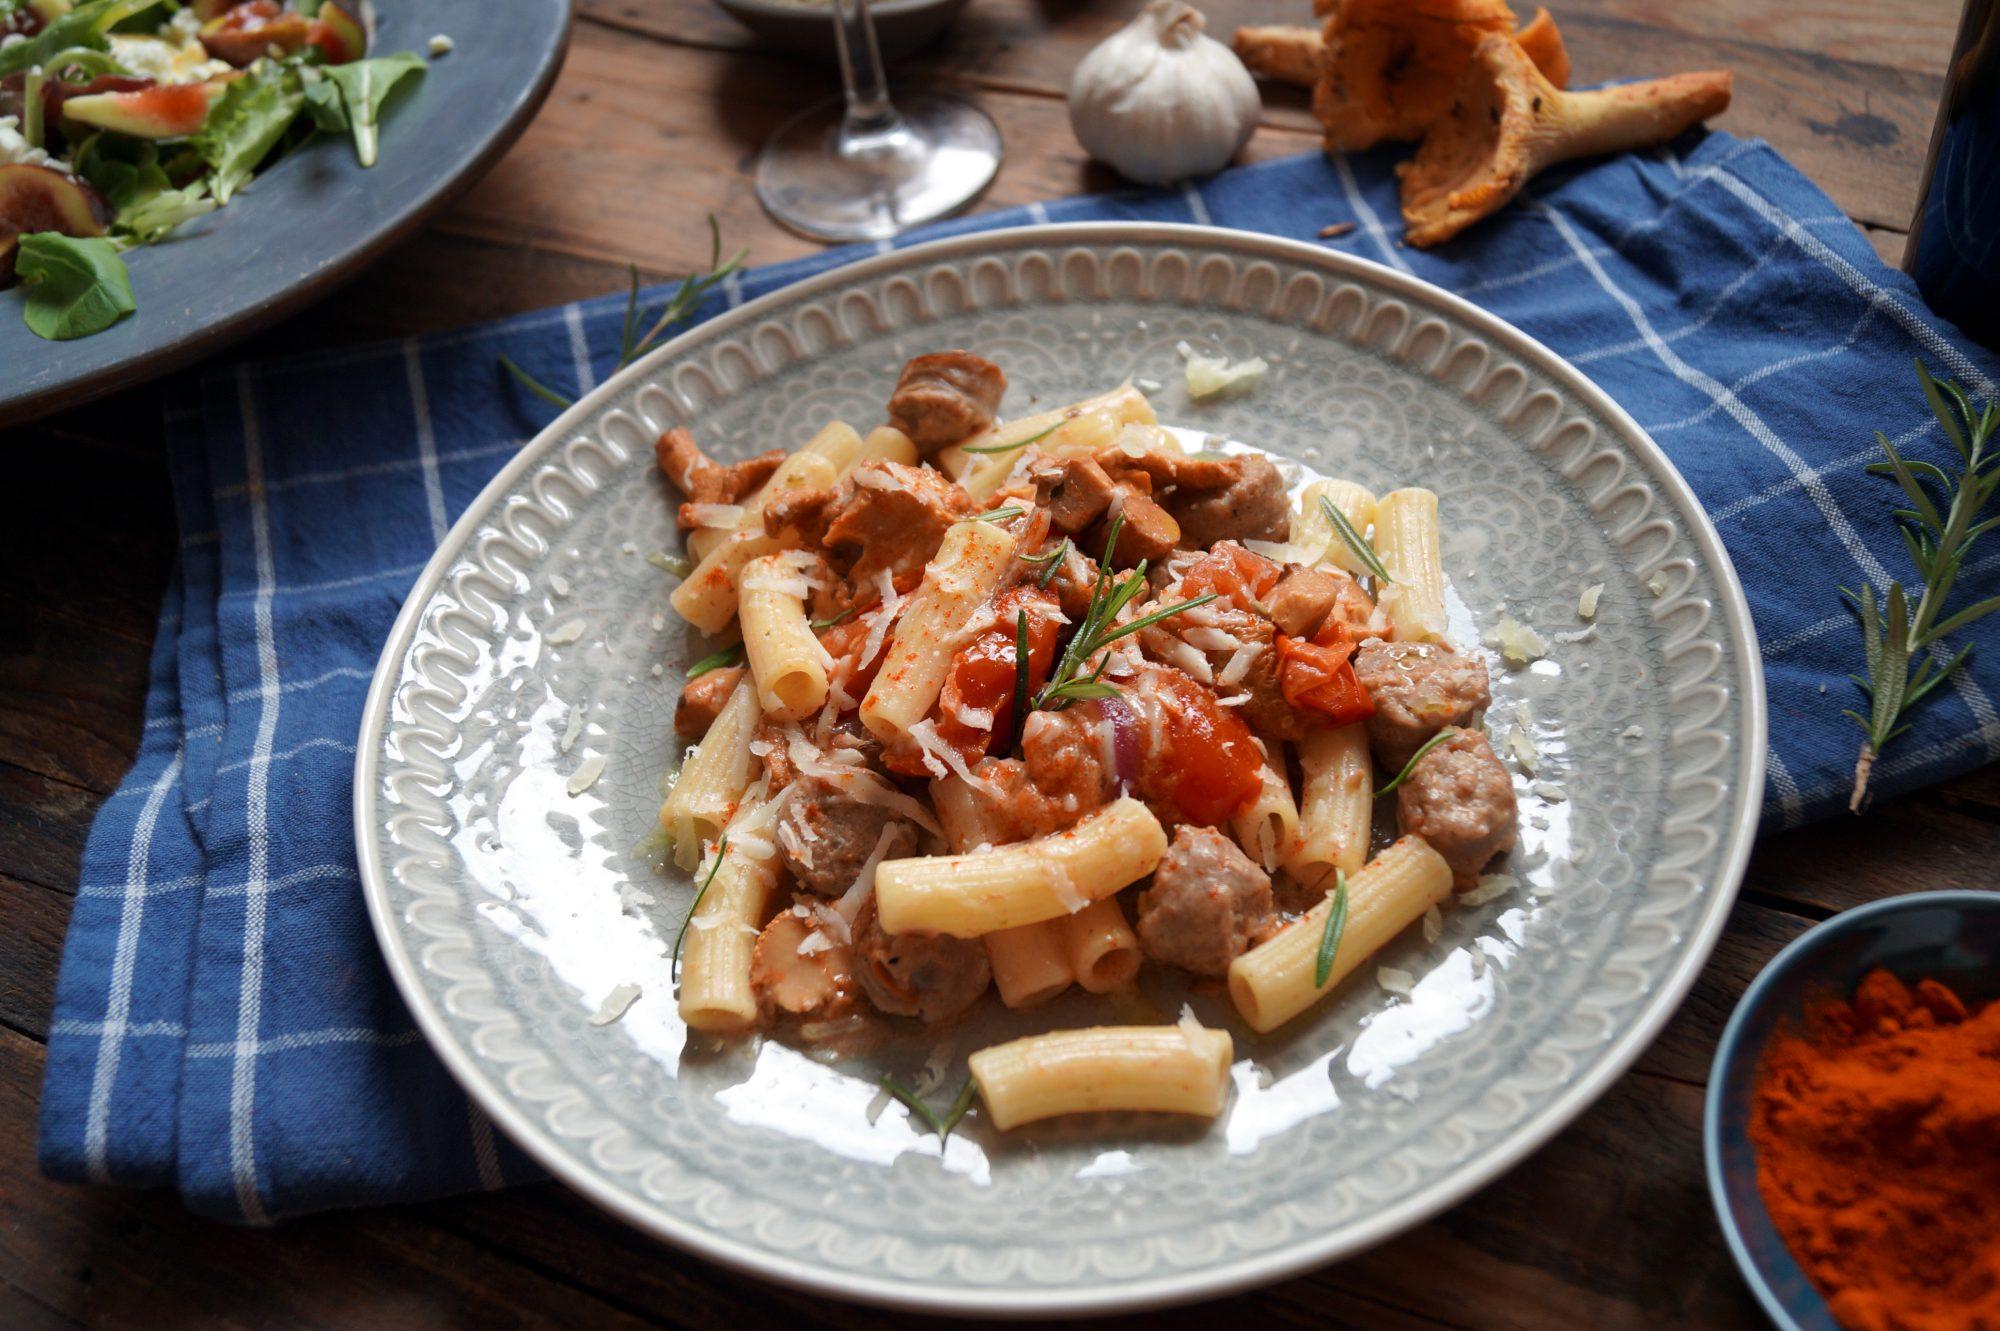 Rigatoni mit Salsiccia und Pfifferlinge in Tomaten-Rahm